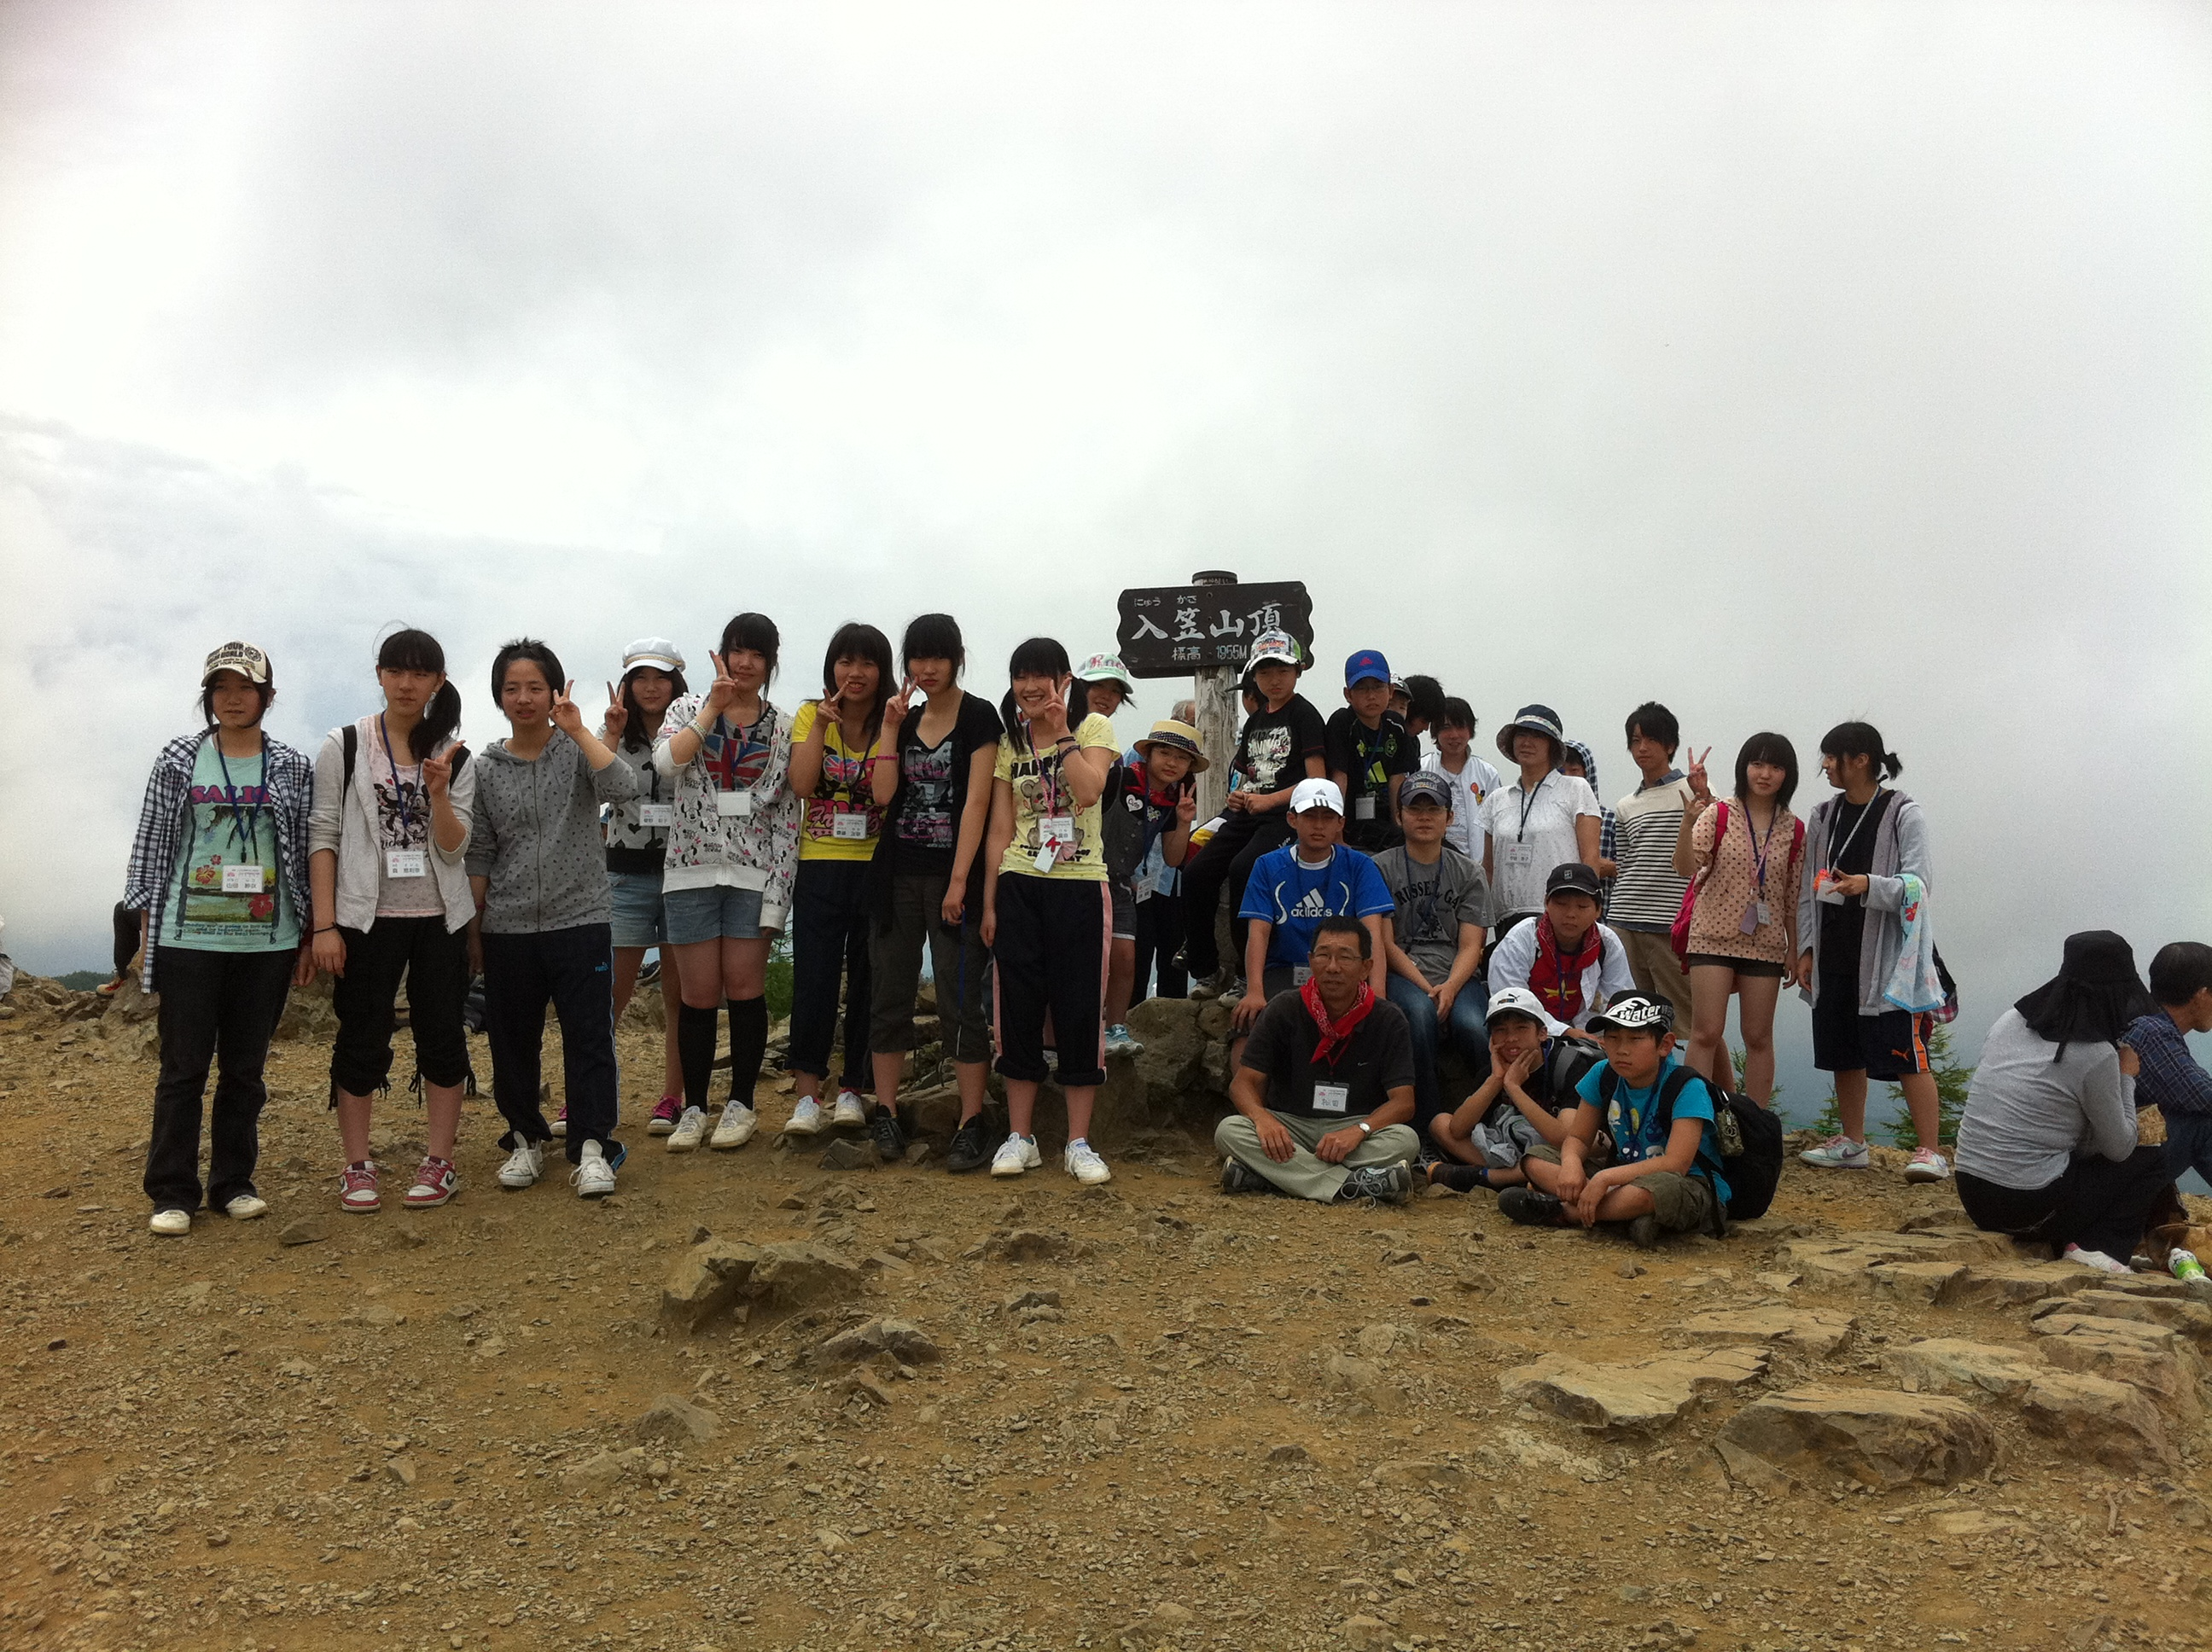 http://www.kodomonotsubasa.com/2011/07/26/0726hiking30.JPG